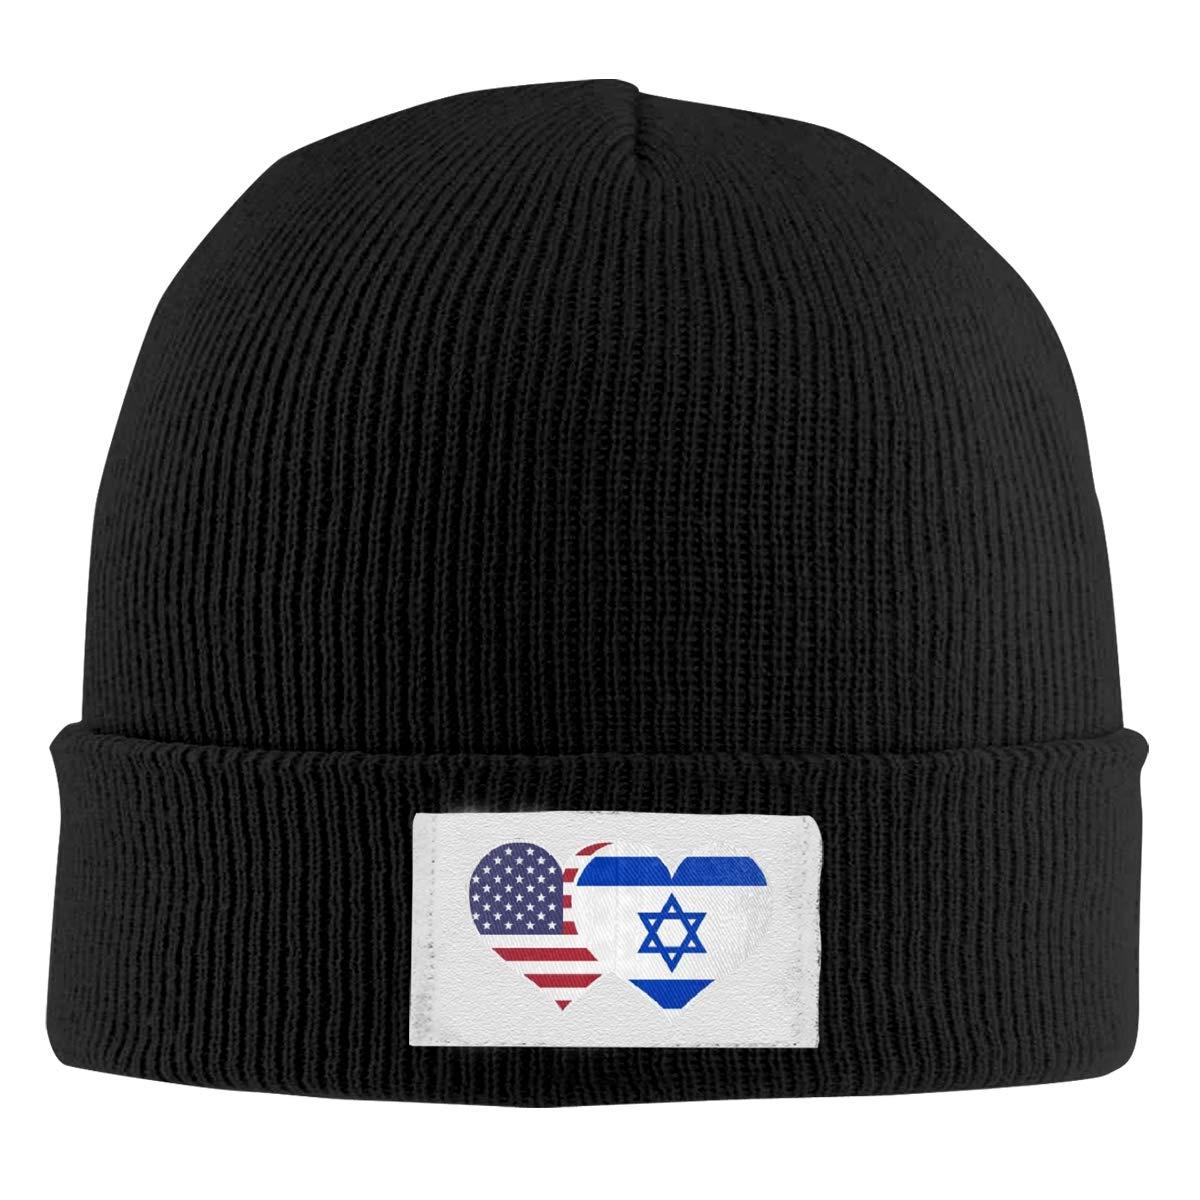 American Israel Flag Heart Top Level Beanie Men Women Unisex Stylish Slouch Beanie Hats Black